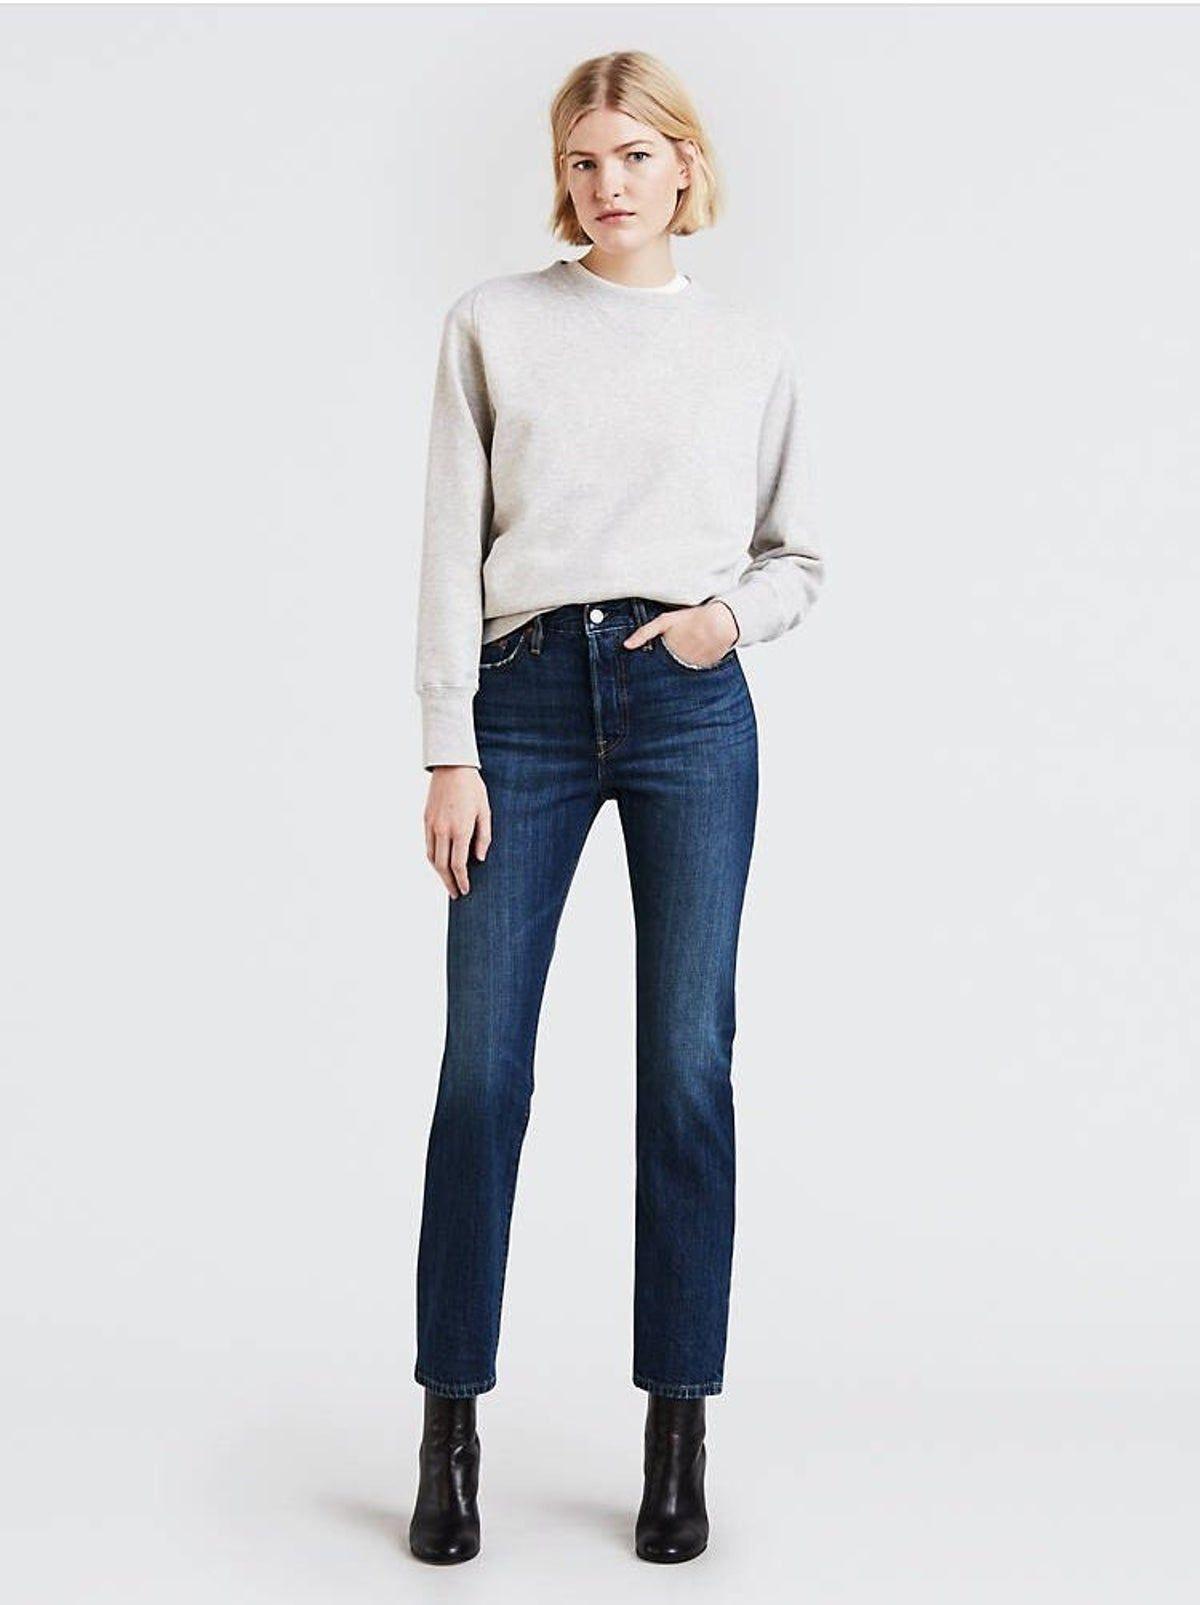 Levi S 501 Original Fit Jeans Side 28 Women Shirt Top Women Jeans Long Sleeve Tees Women Levi's women's ribcage straight ankle jeans at amazon women's jeans store. pinterest